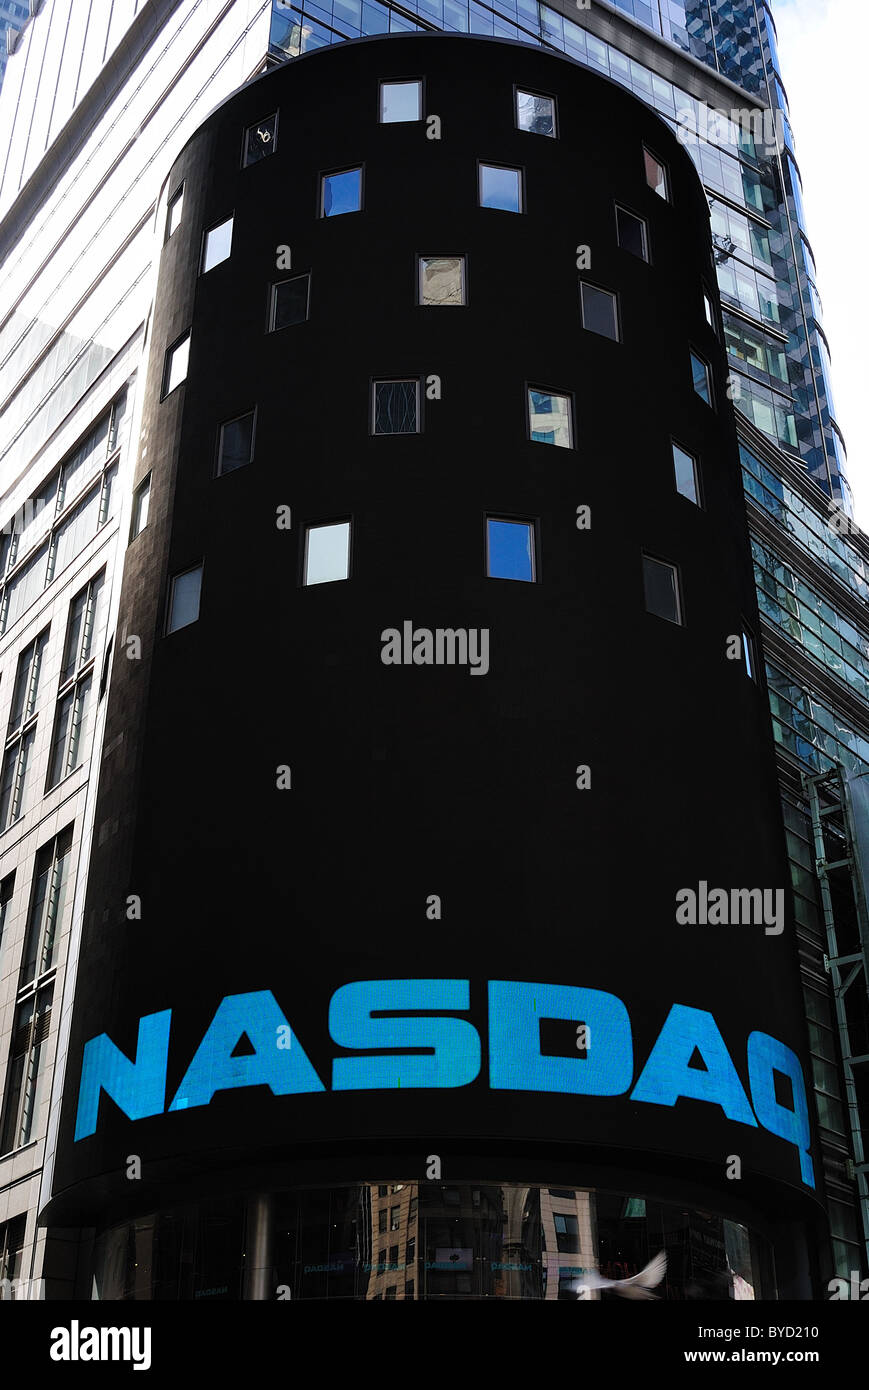 NASDAQ Stock Exchange in Times Square - Stock Image